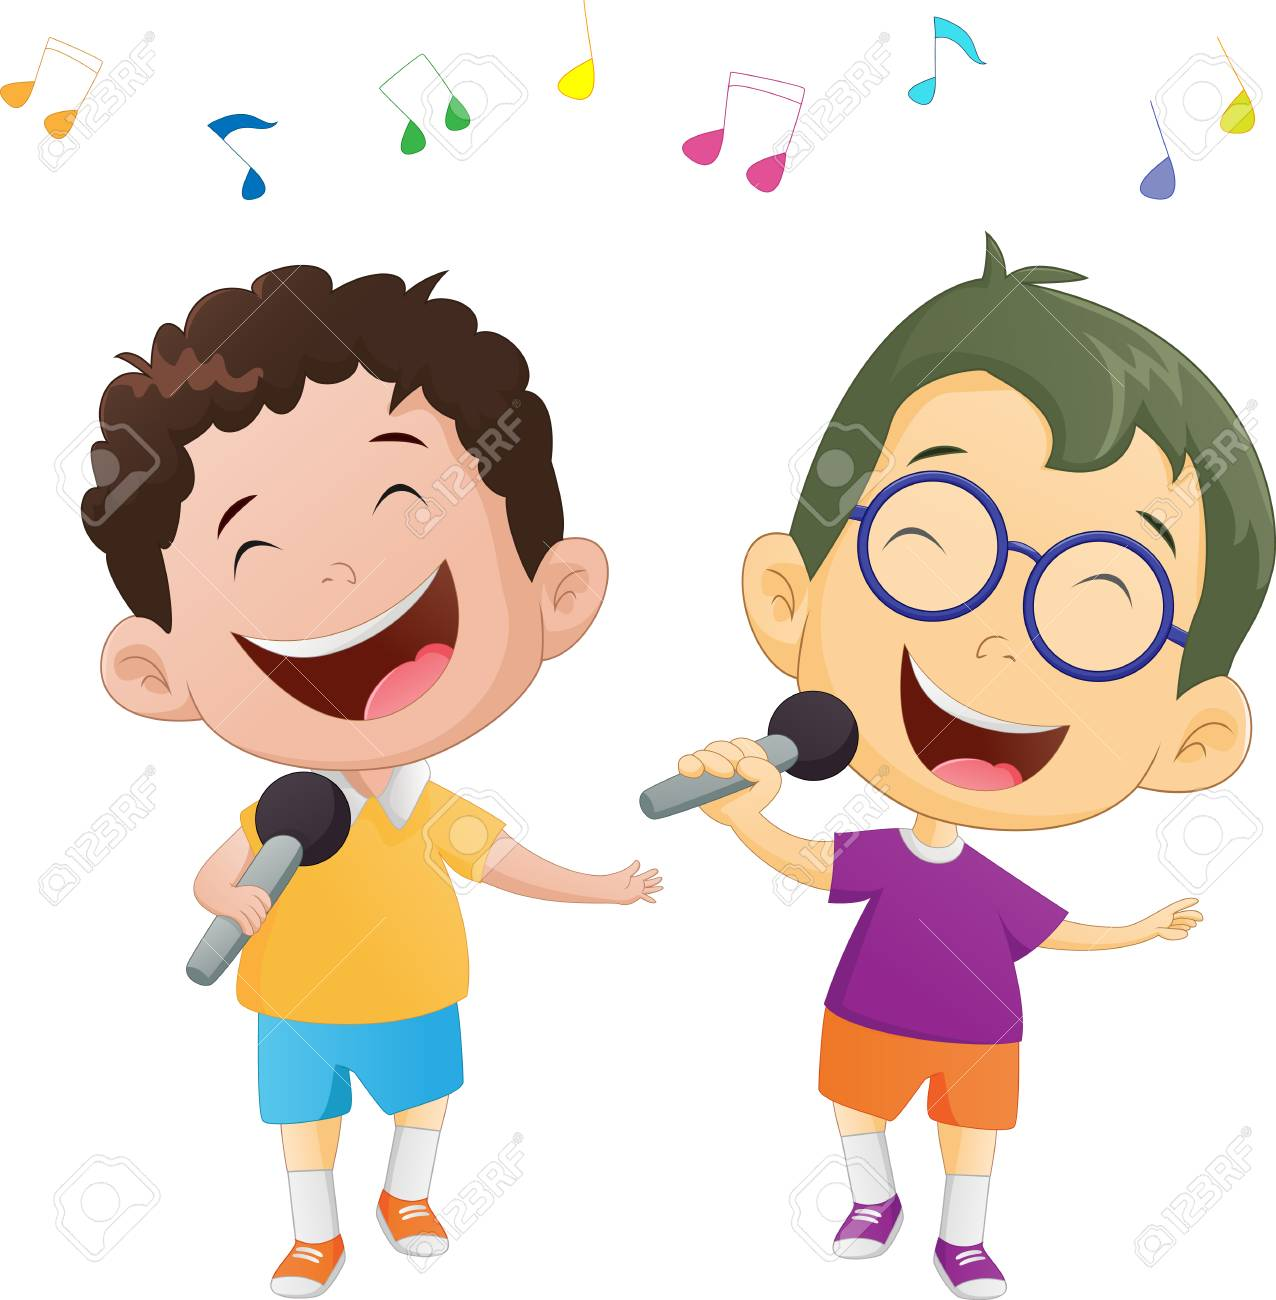 Illustration of happy singing boys.